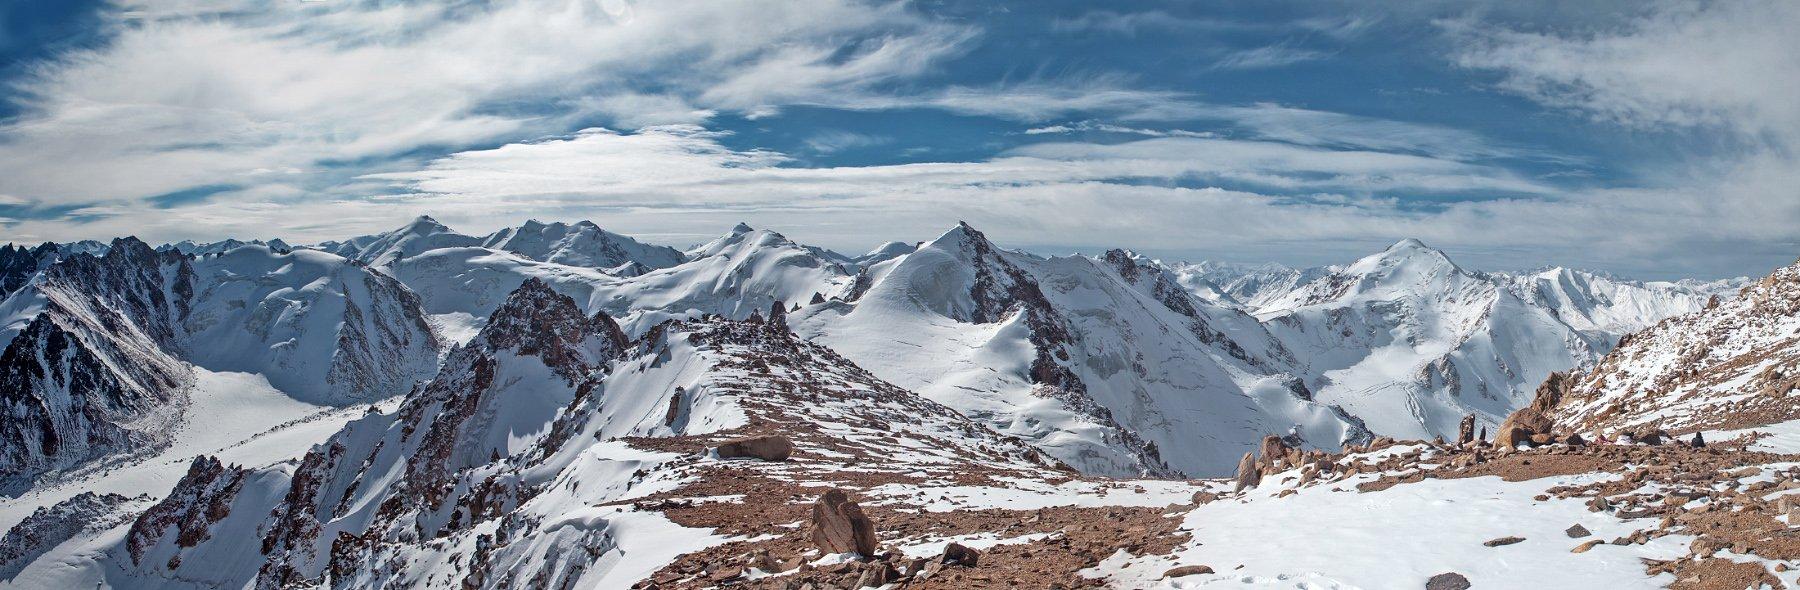 Almaty, Climb, Climbing, Clouds, Glacier, Hiking, Ice, Kazakhstan, Mountains, Peaks, Rocks, Sky, Snow, Summits, Anton Akhmatov